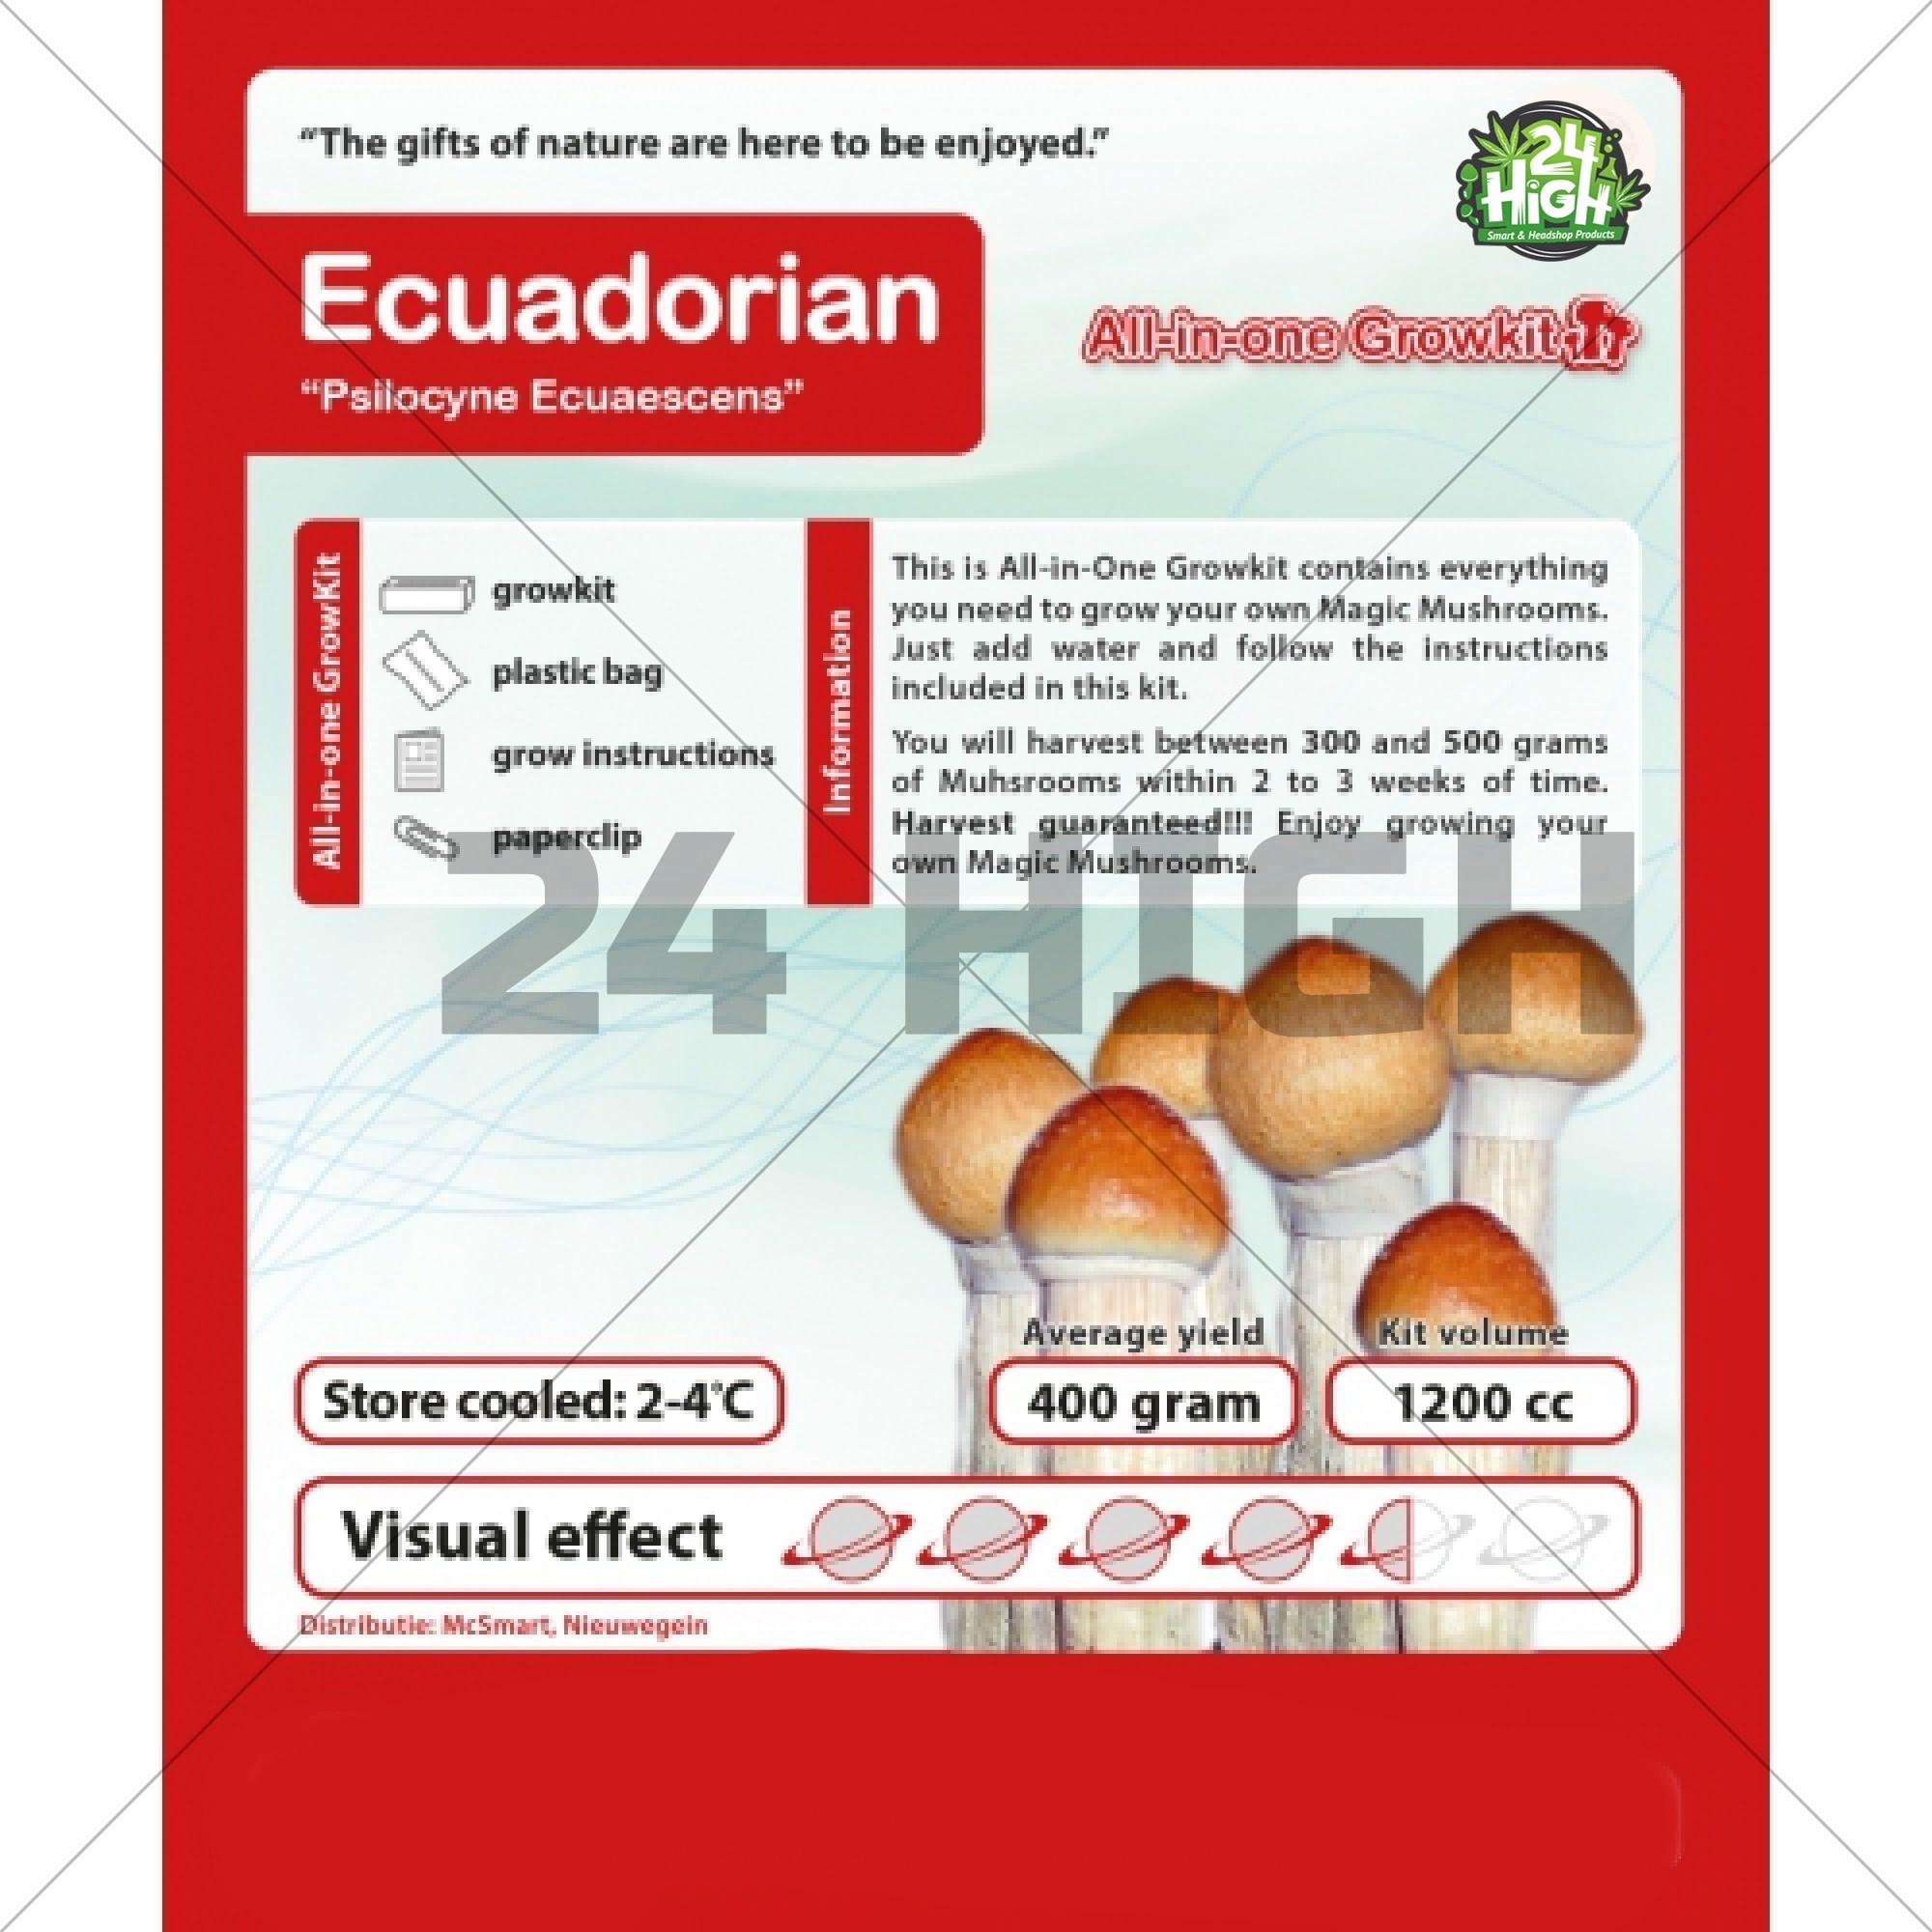 Ecuadorian All in one Growkit